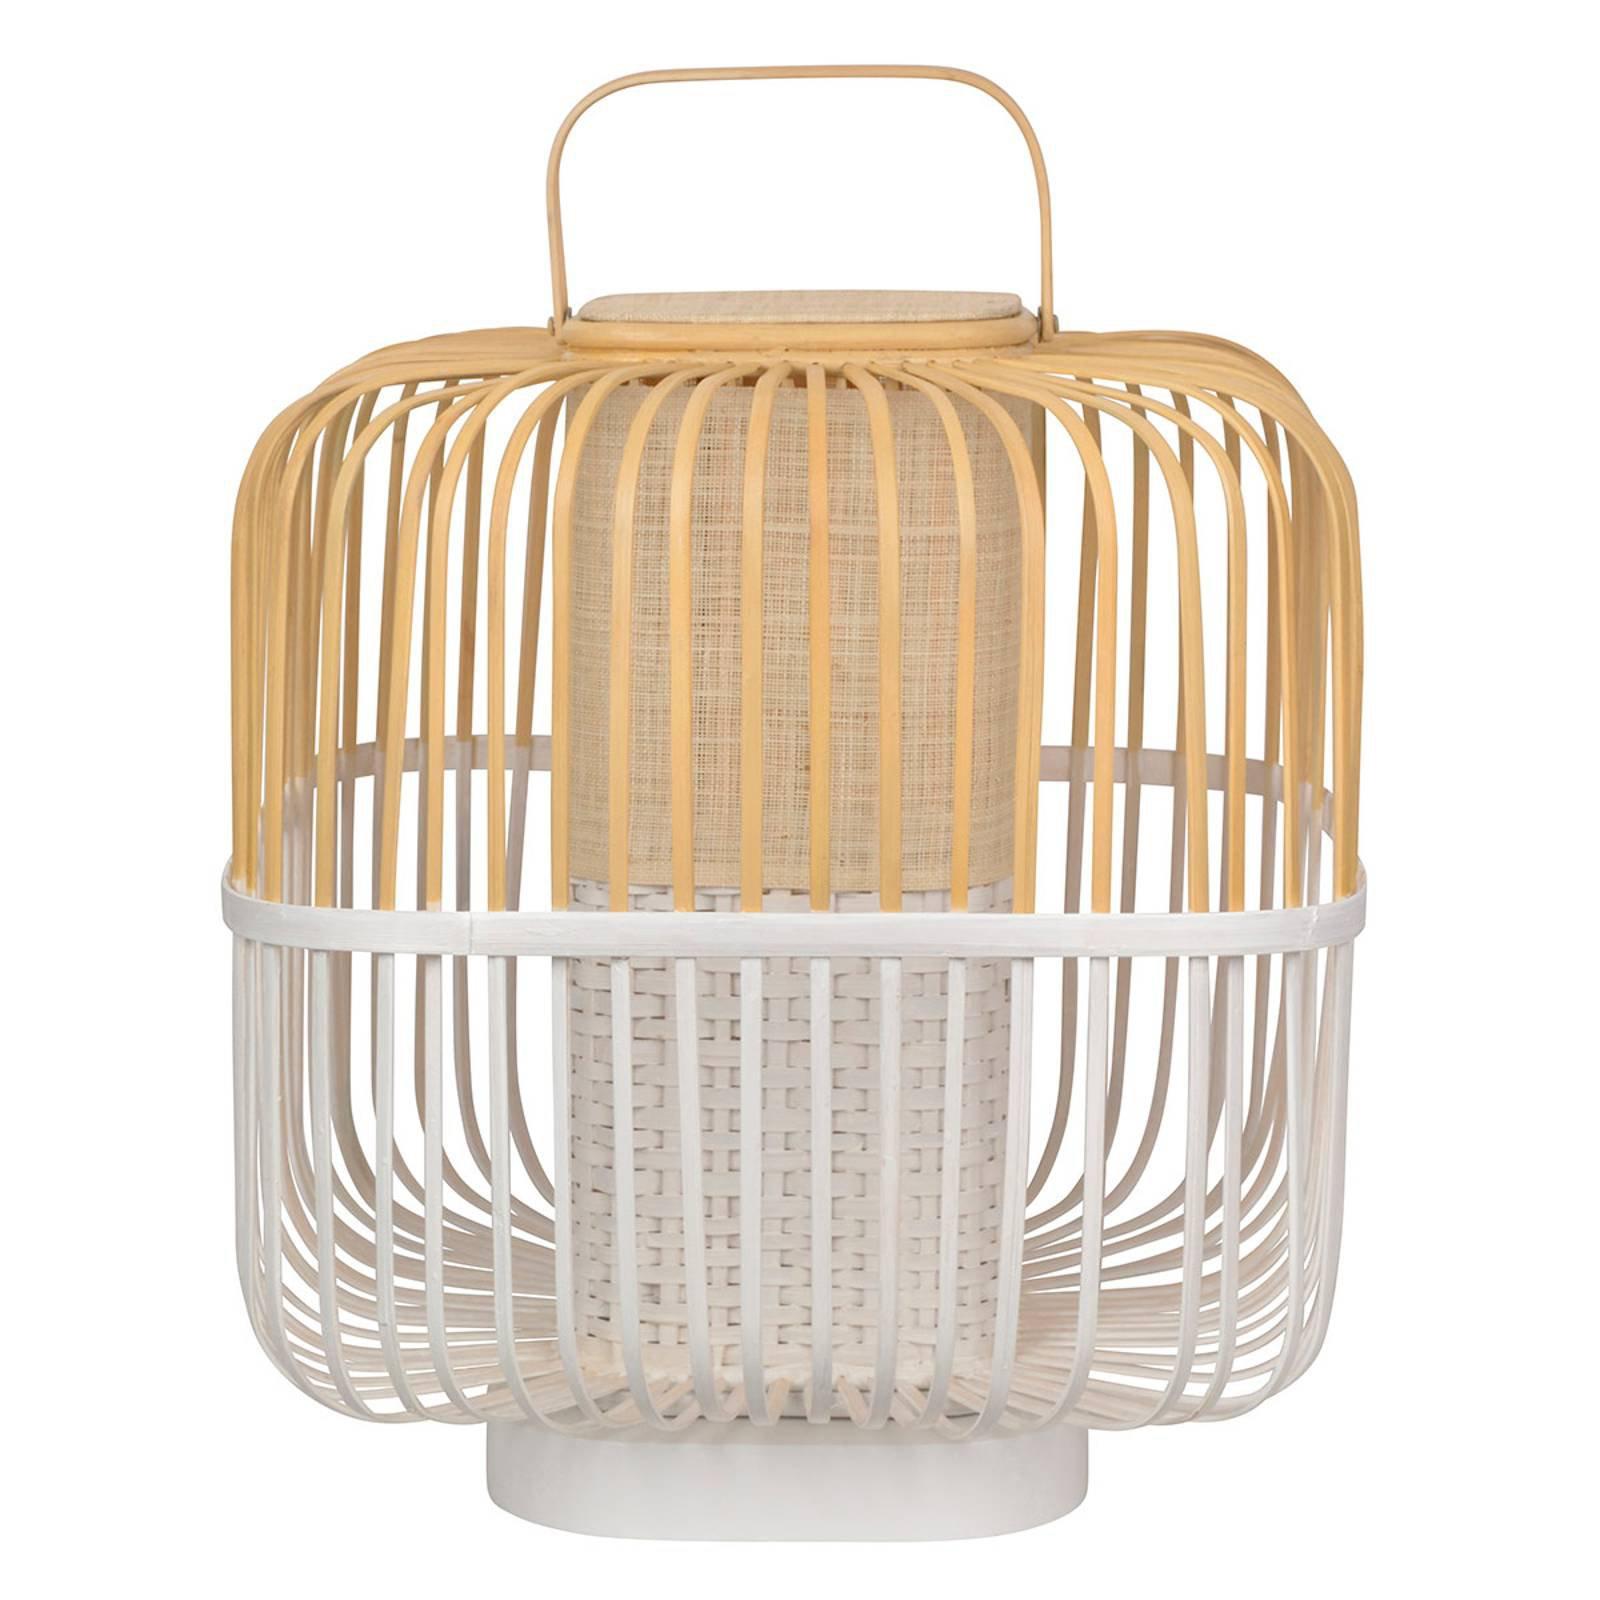 Forestier Bamboo Square M bordlampe i hvit